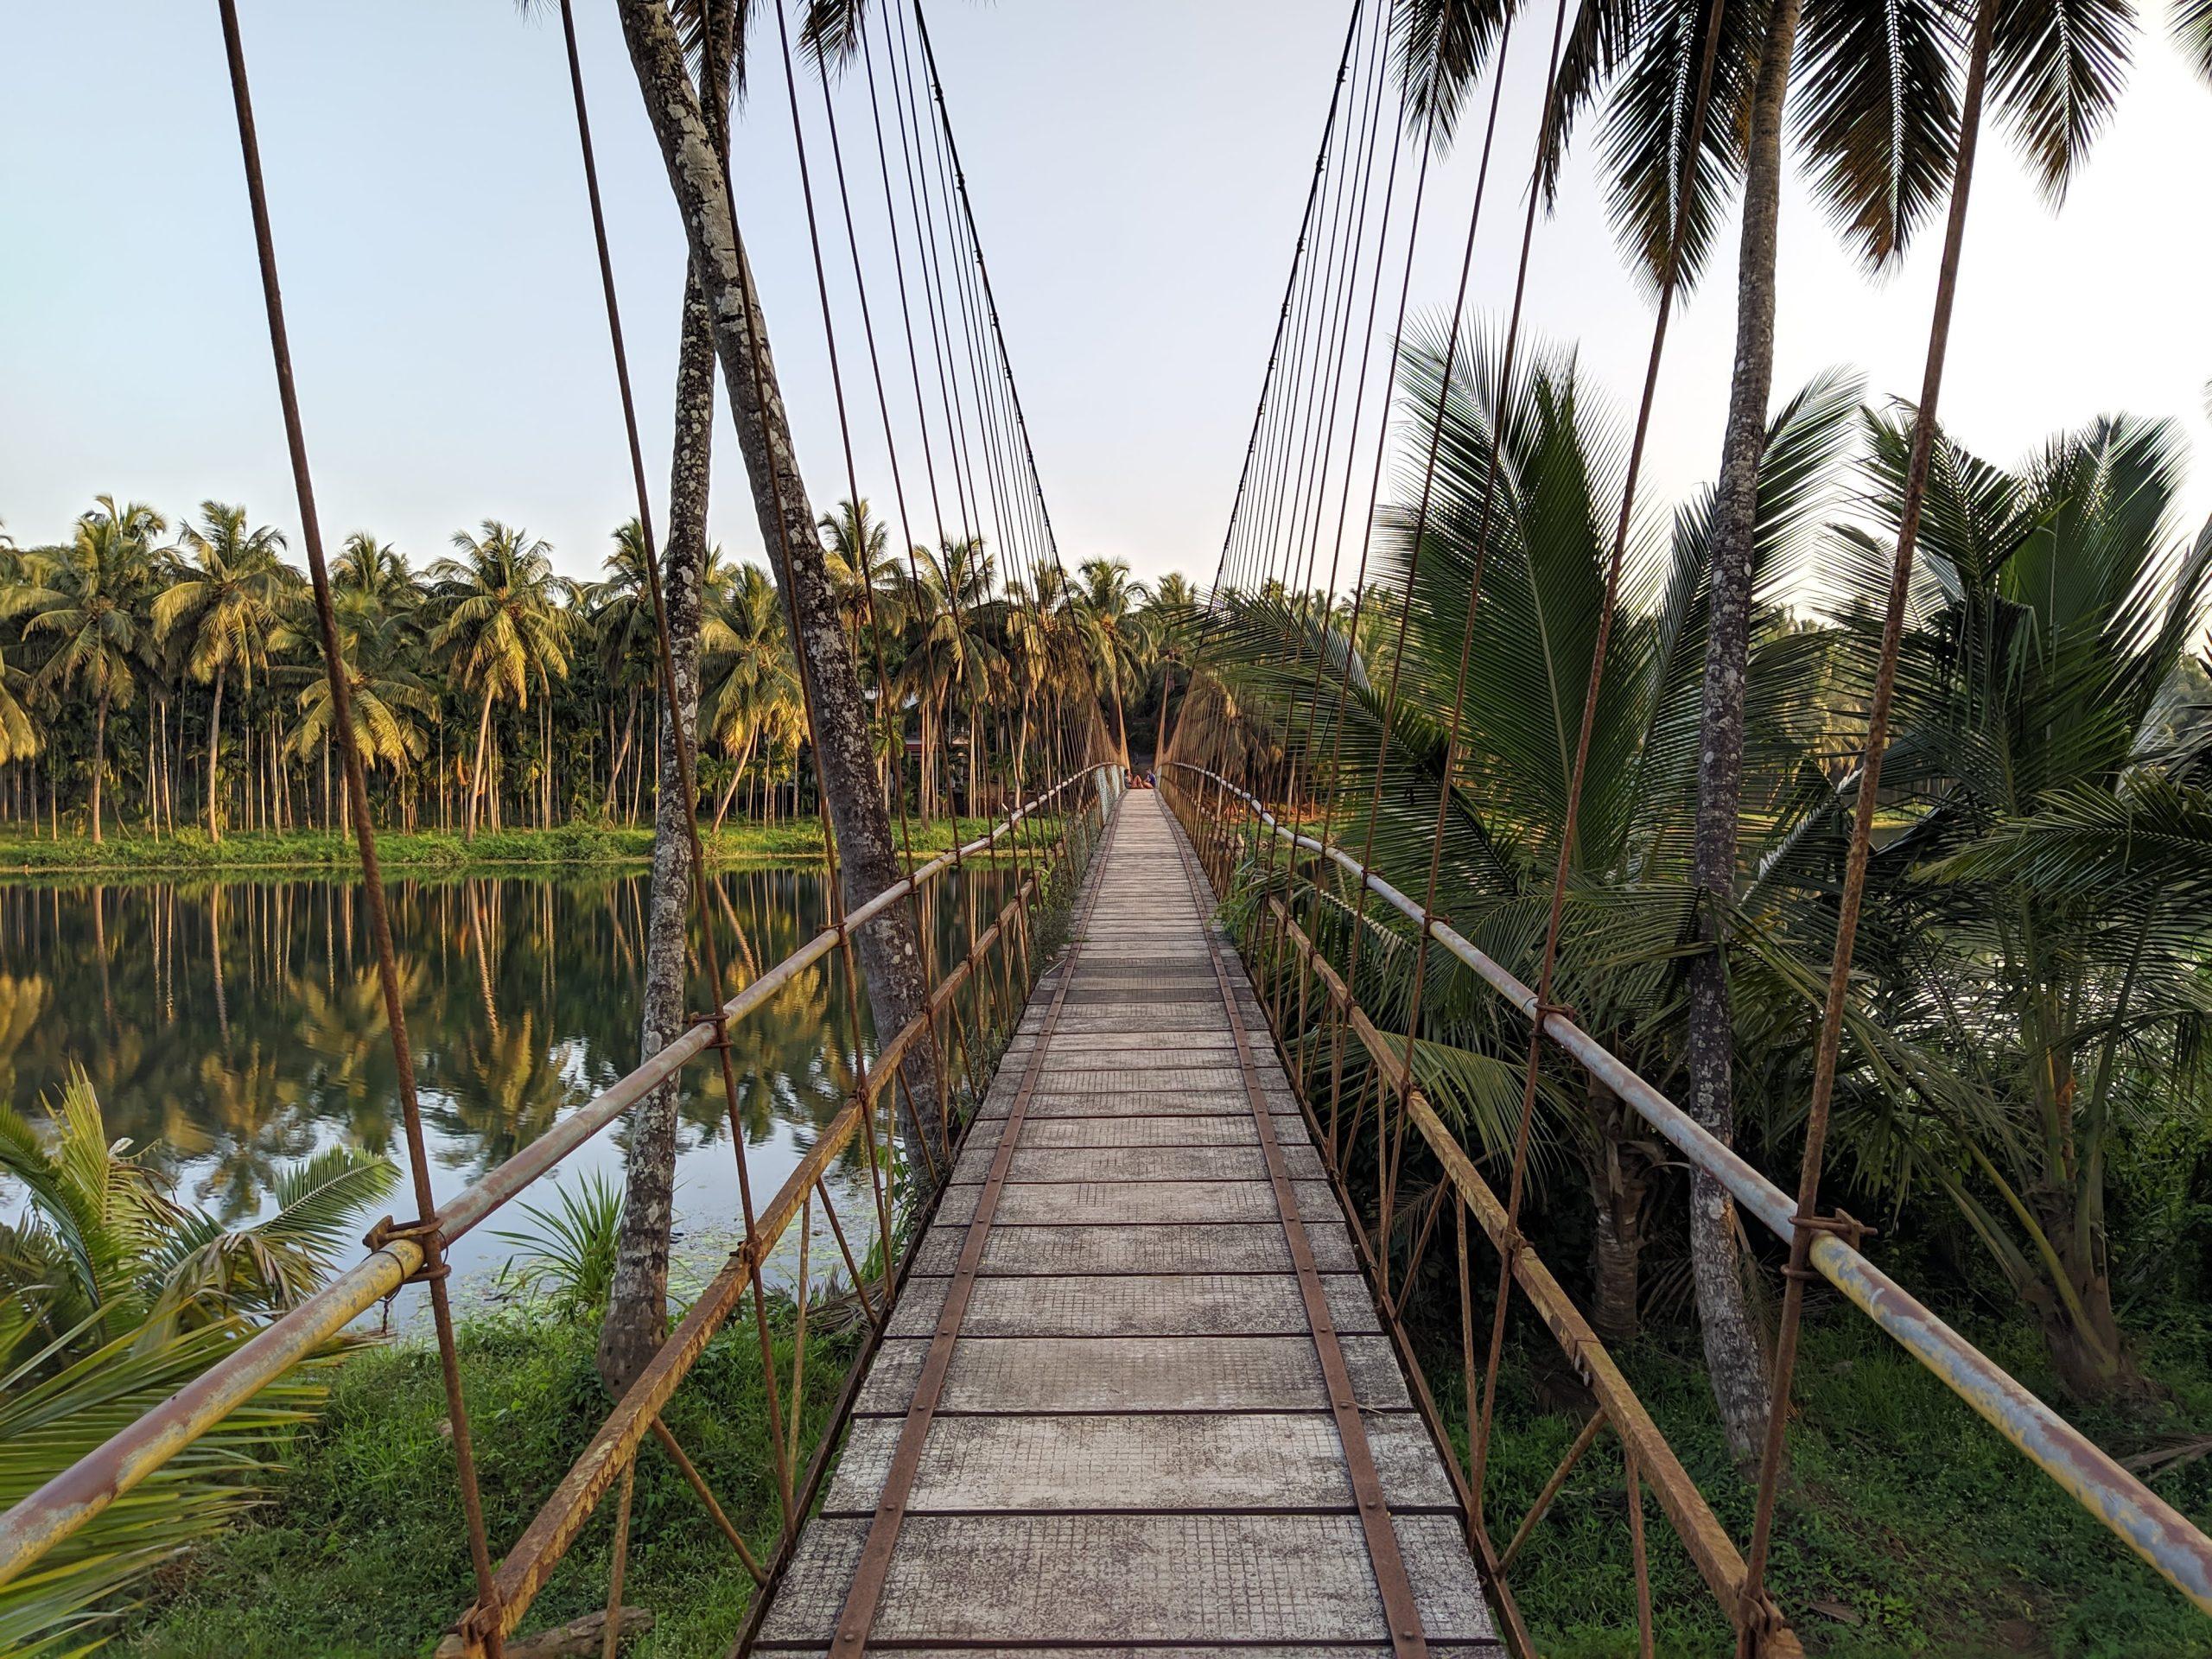 Suspension Bridge on a river